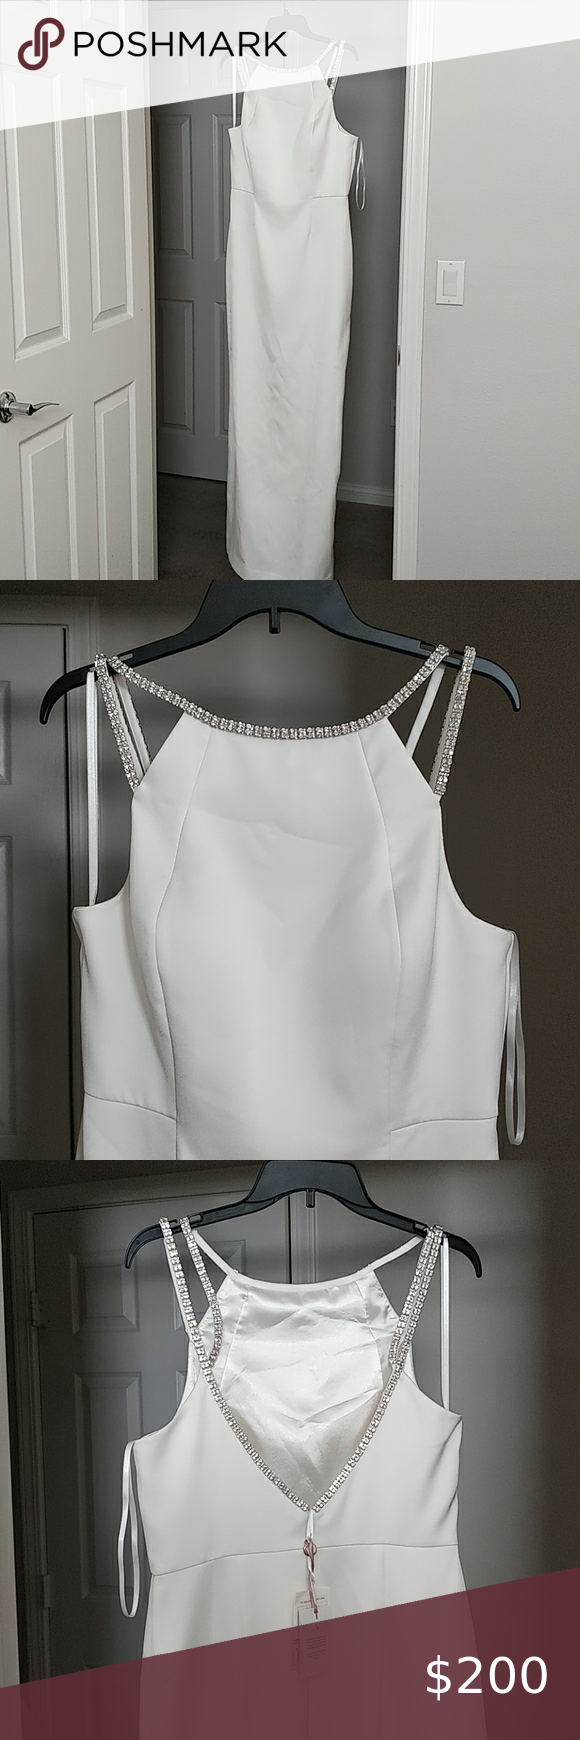 Ted Baker wedding dress in 2020 Ted baker wedding dress